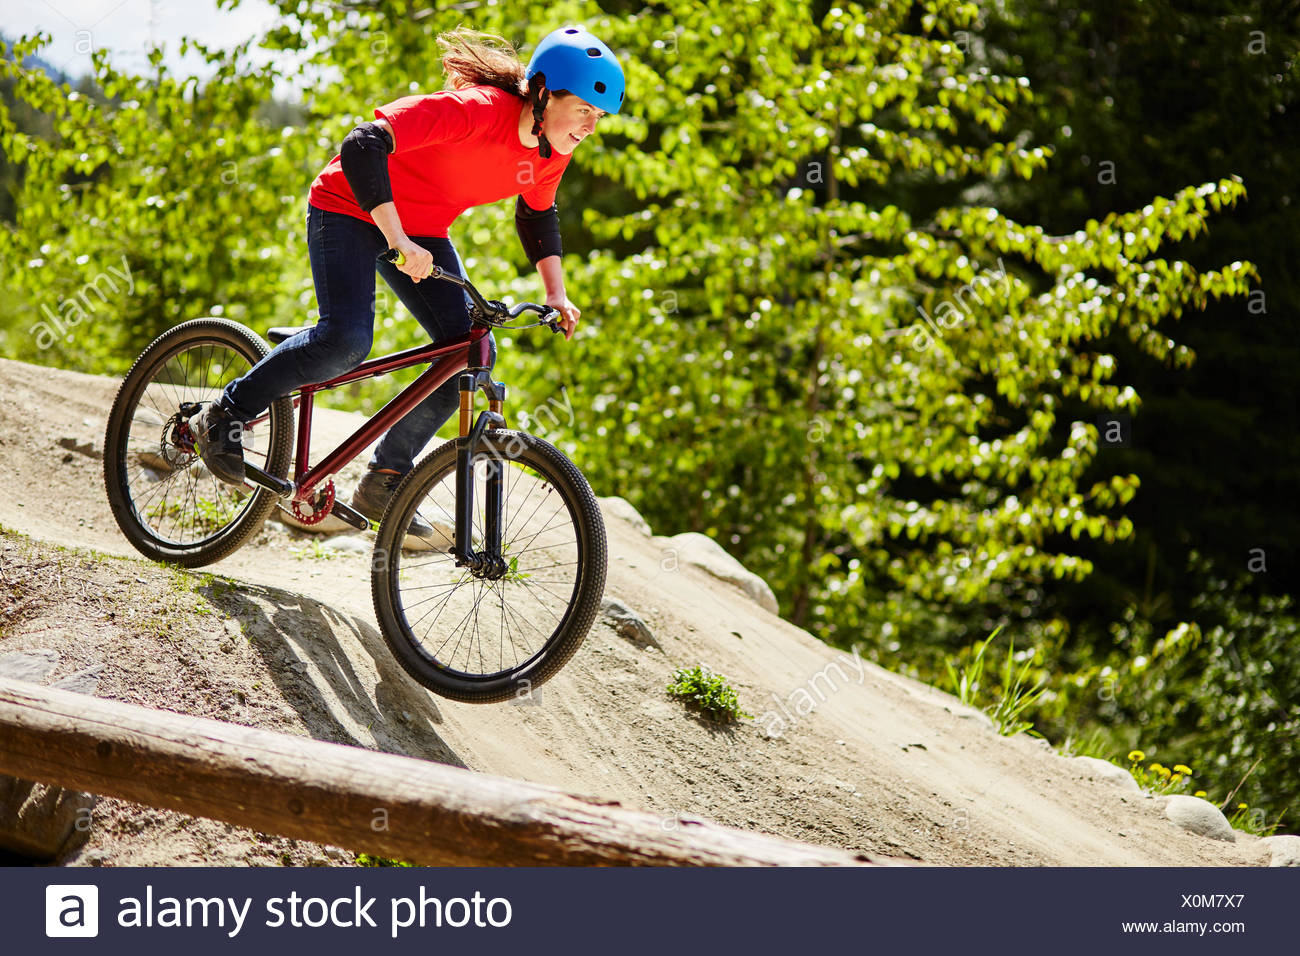 Hembra joven ciclista de BMX aceleración rocas en el bosque Imagen De Stock